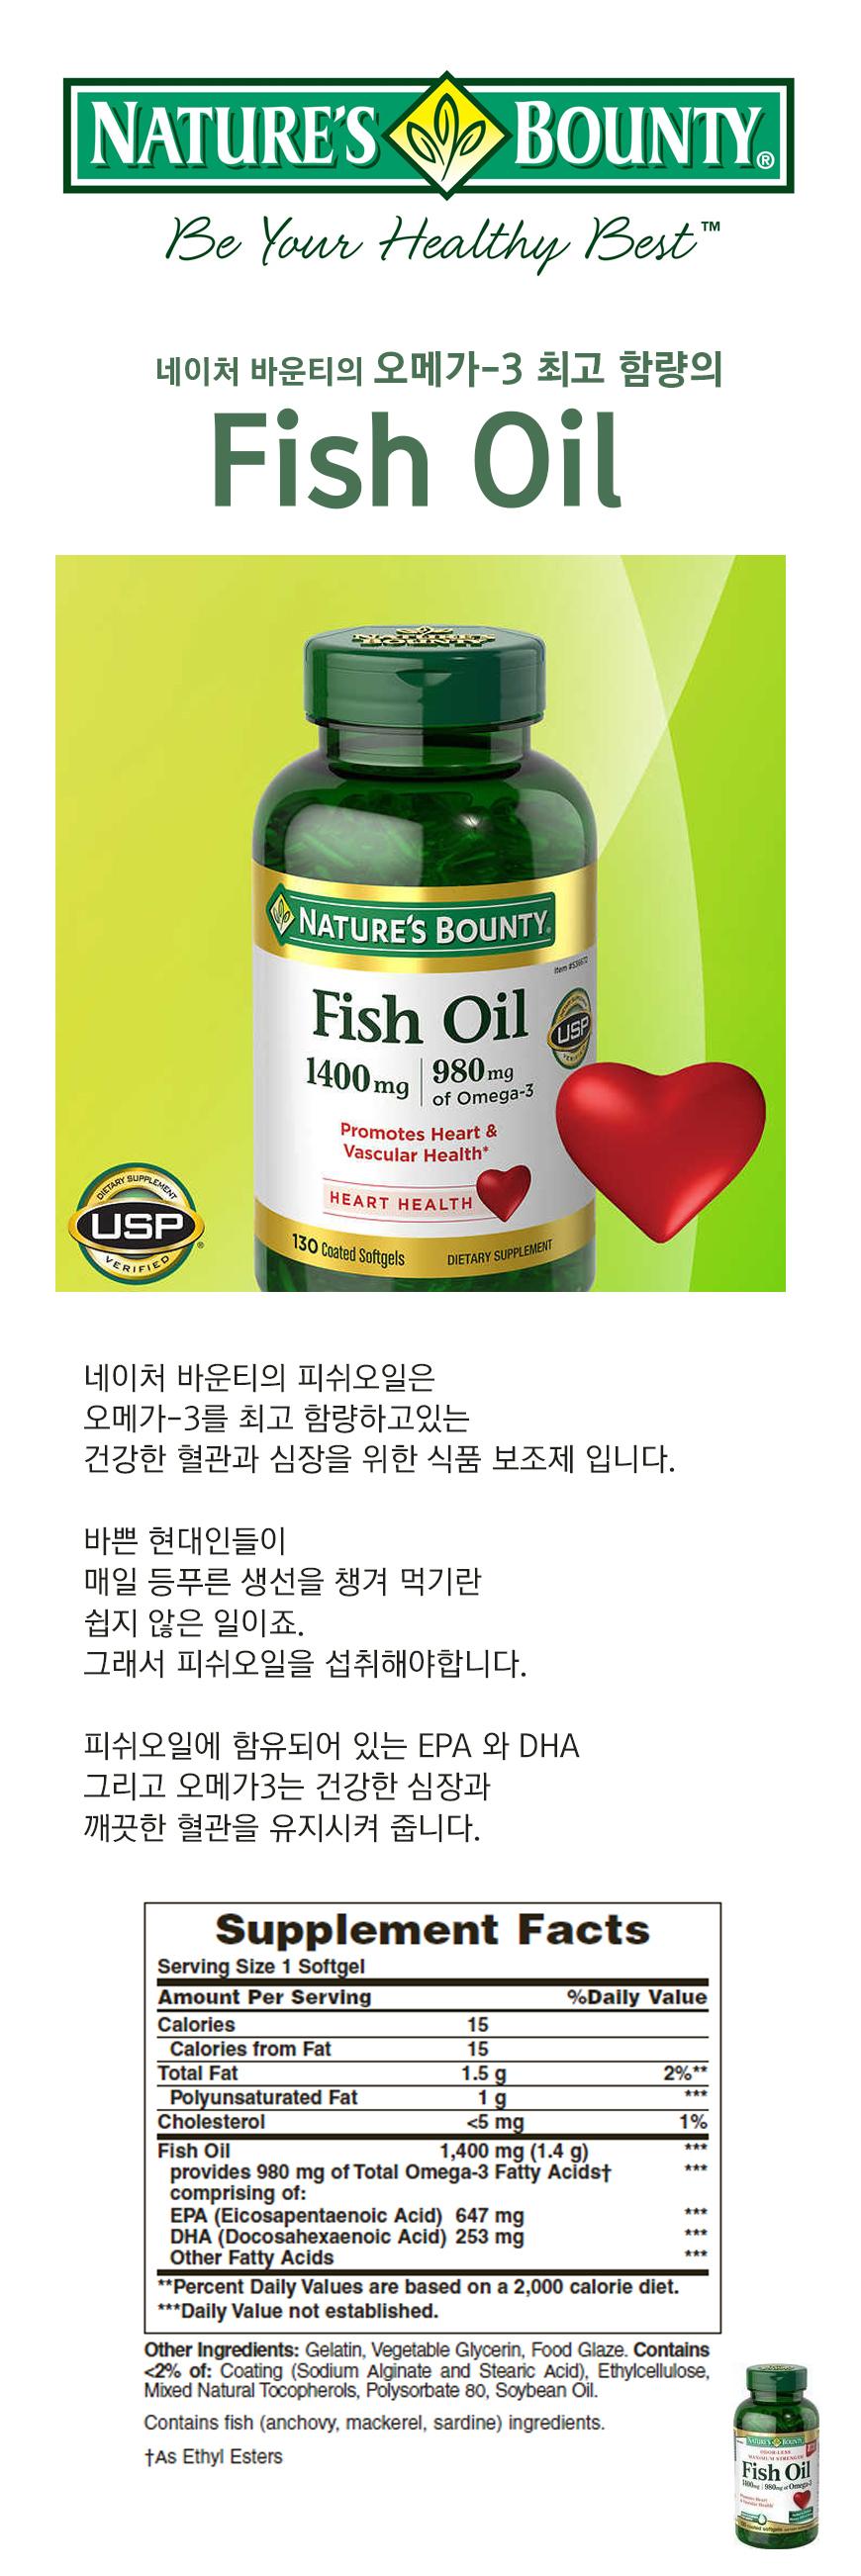 FISHOIL.jpg